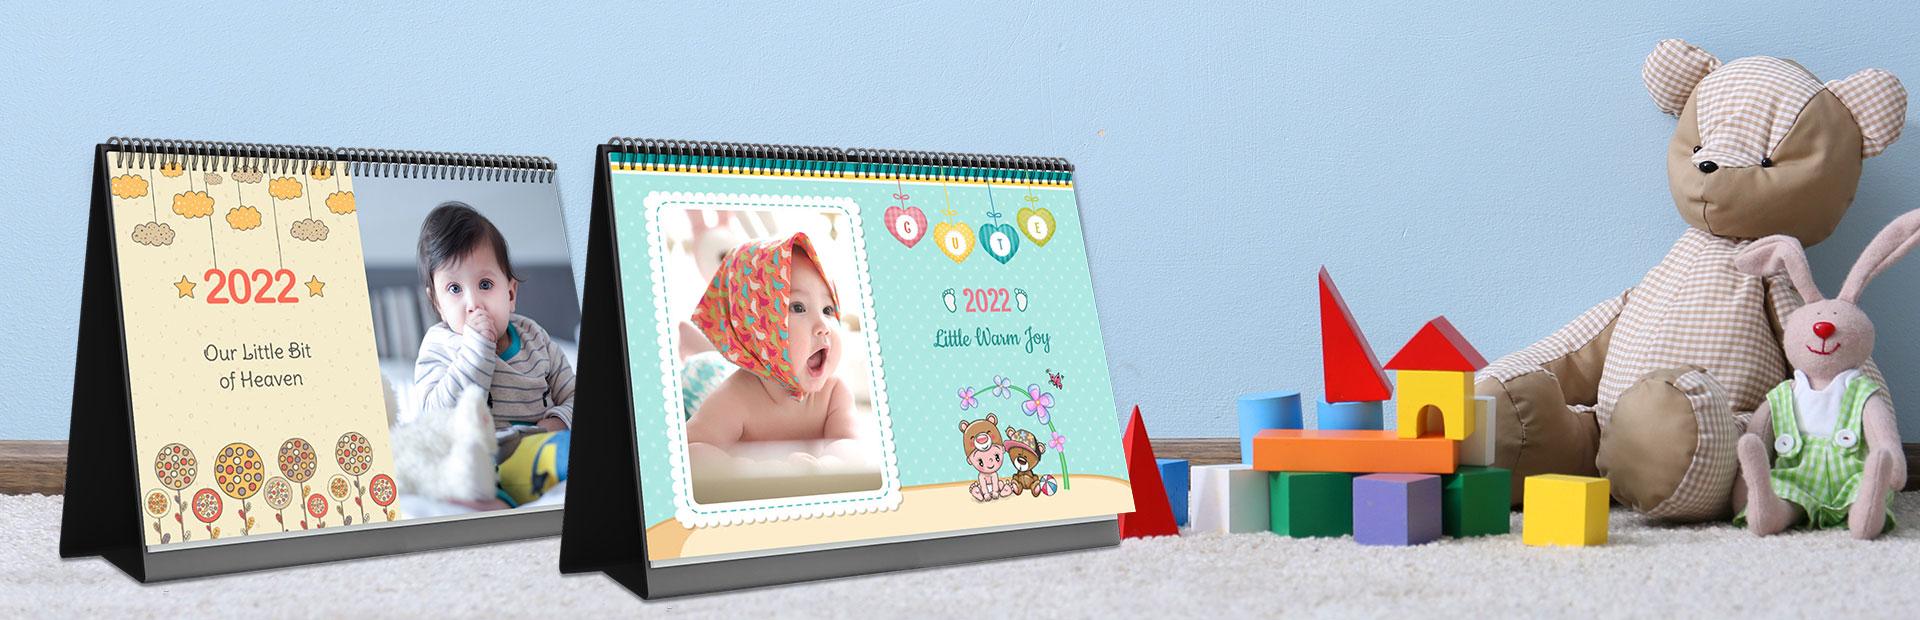 Kids Desk Calendars Online